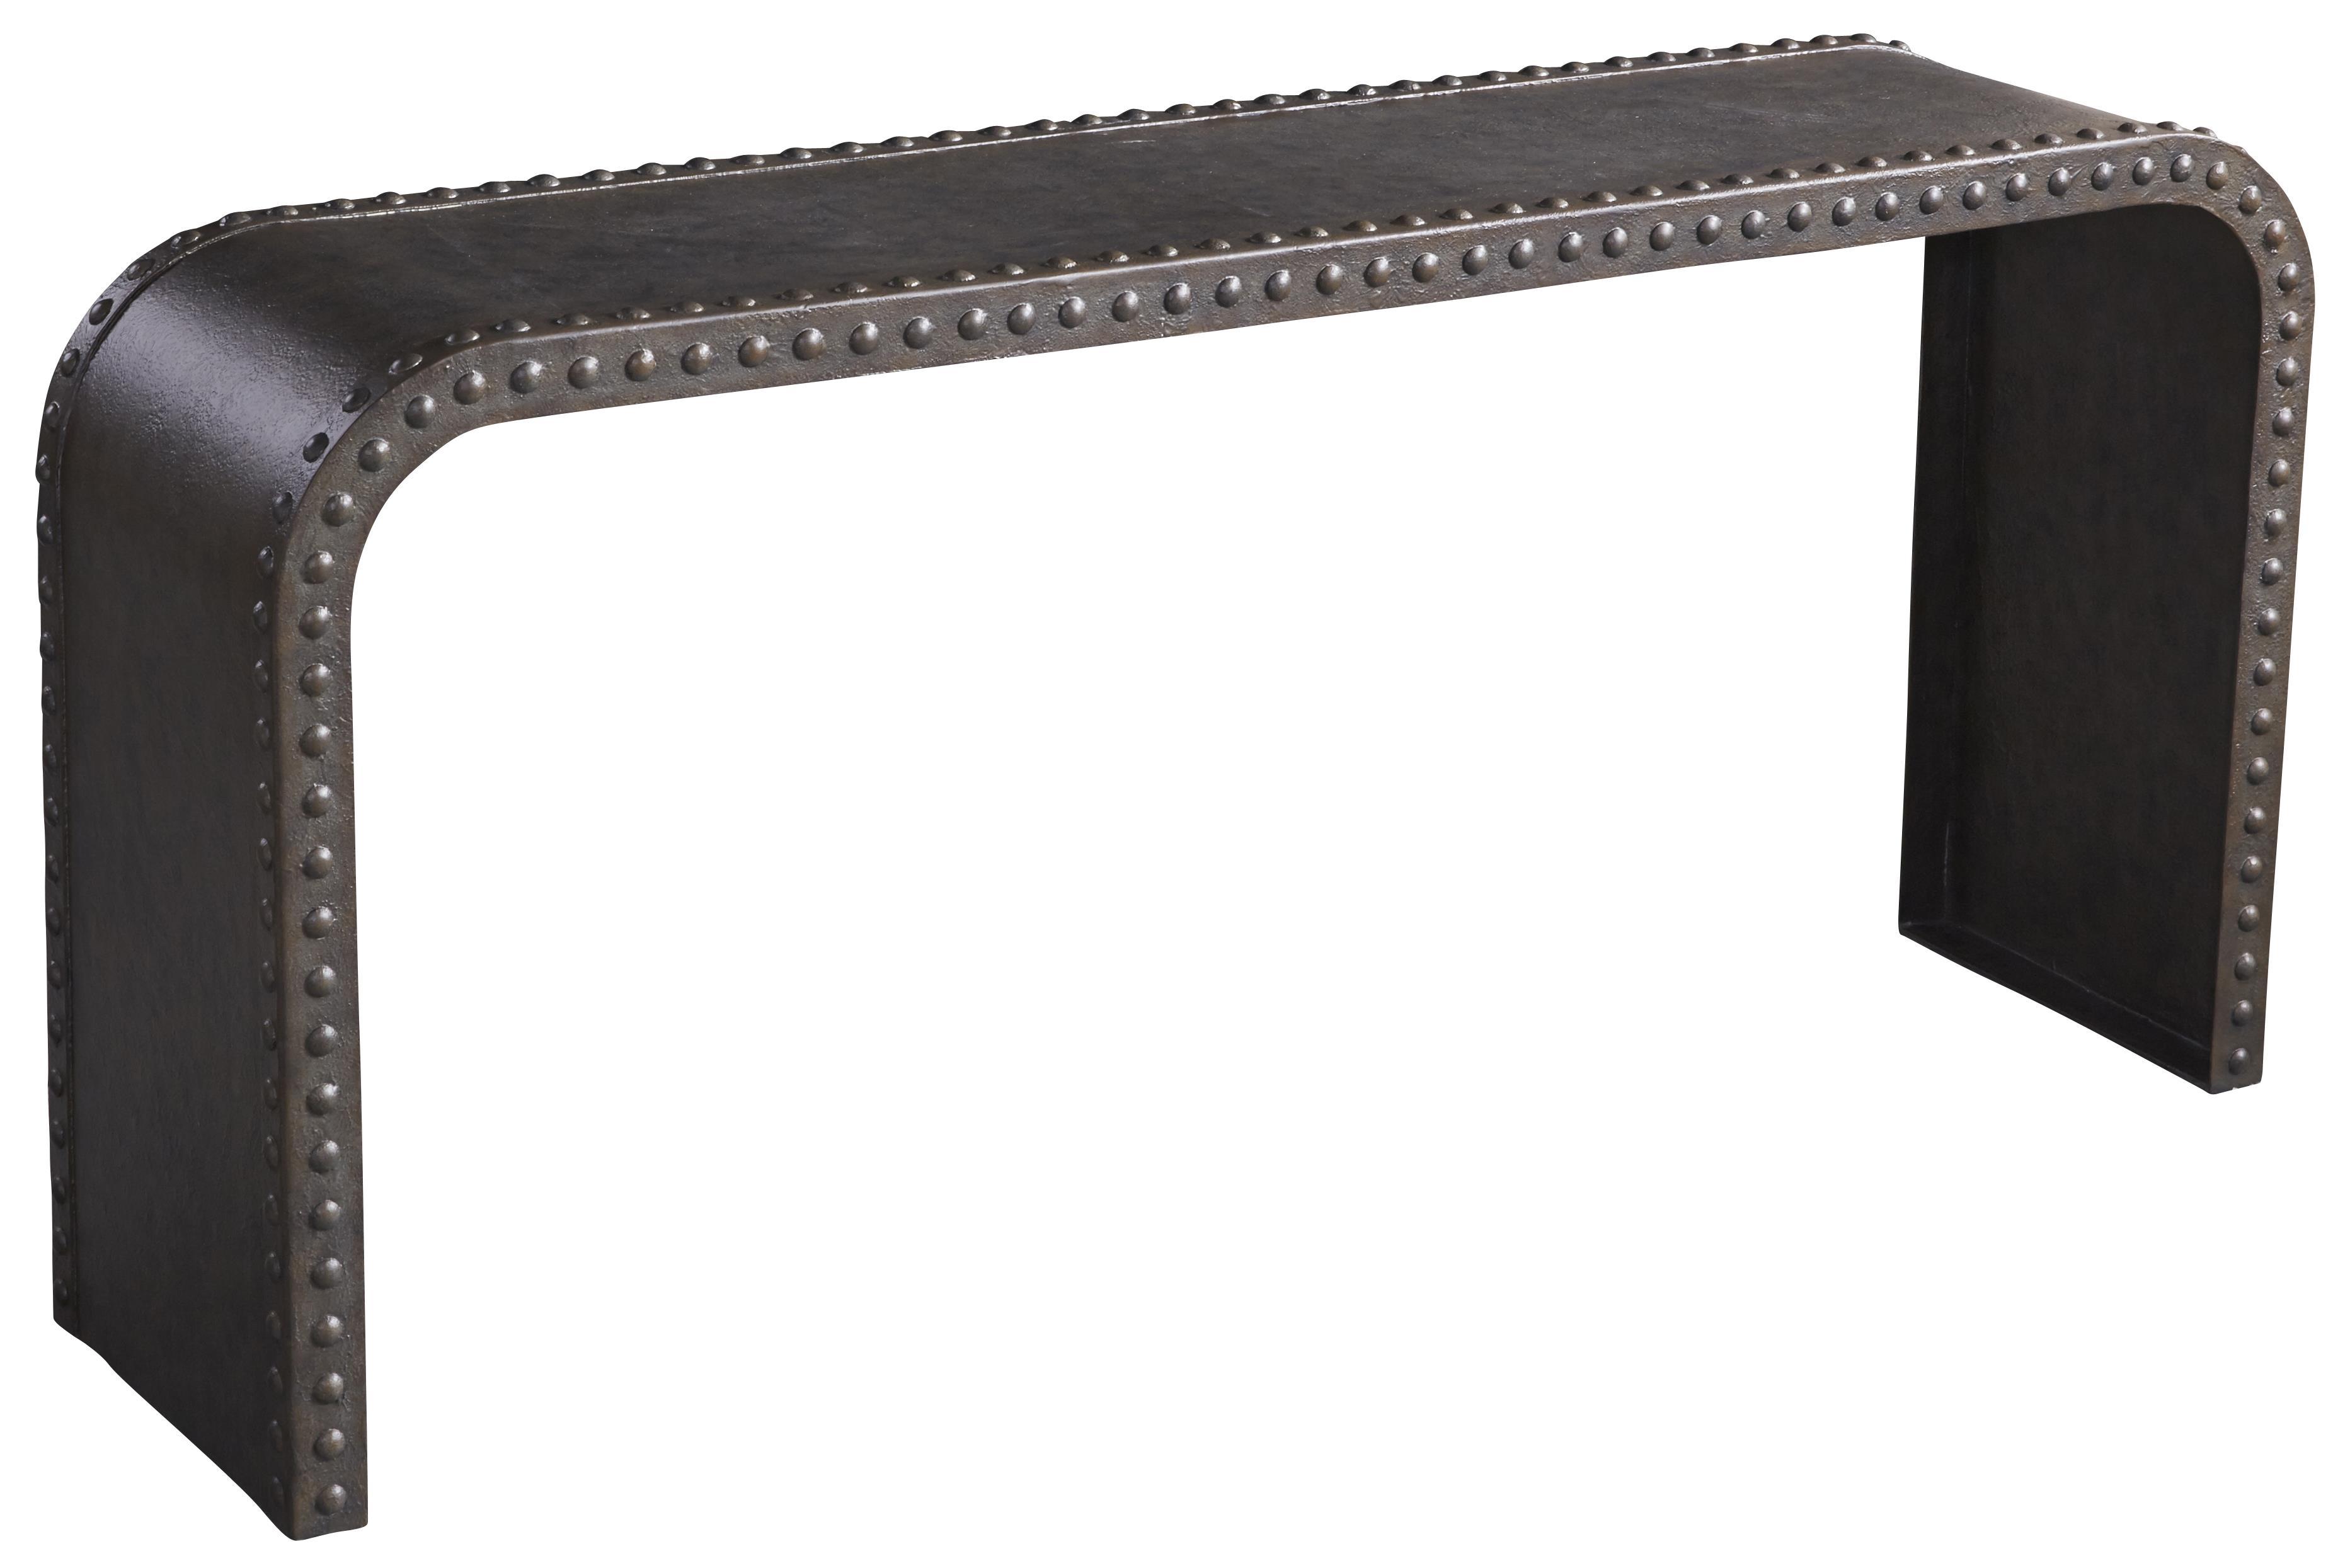 Belfort Signature Urban Treasures Shaw Metal Console Table - Item Number: 223307-1218